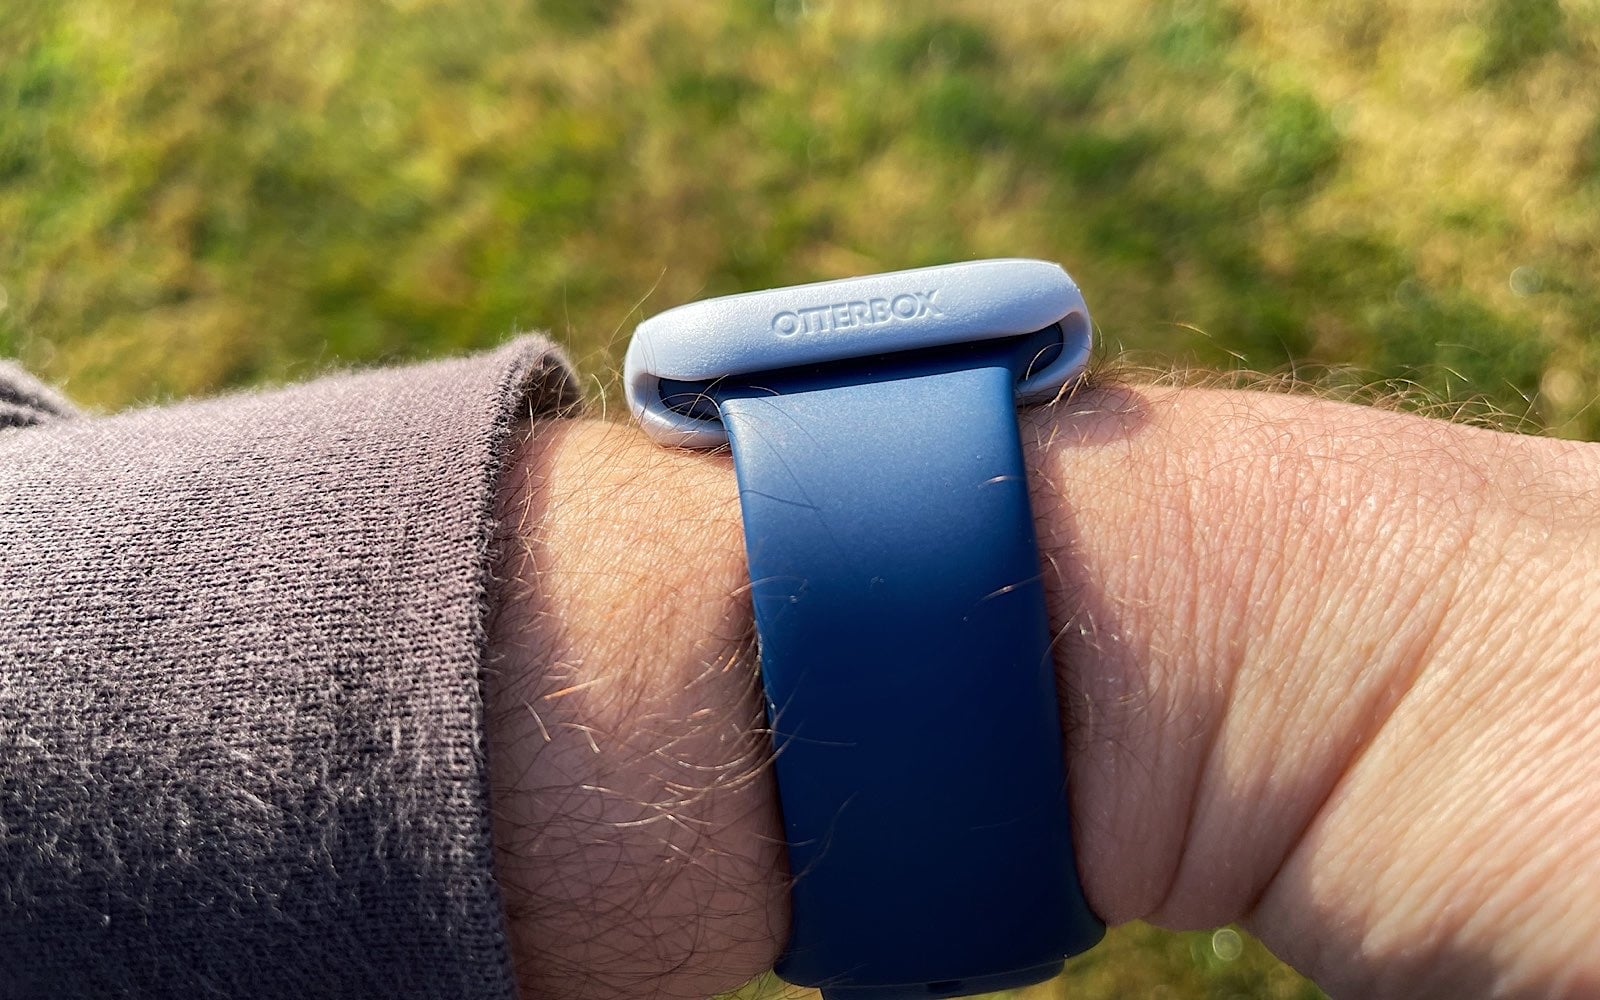 Otterbox's Exo Edge around the Apple Watch Series 6 44mm